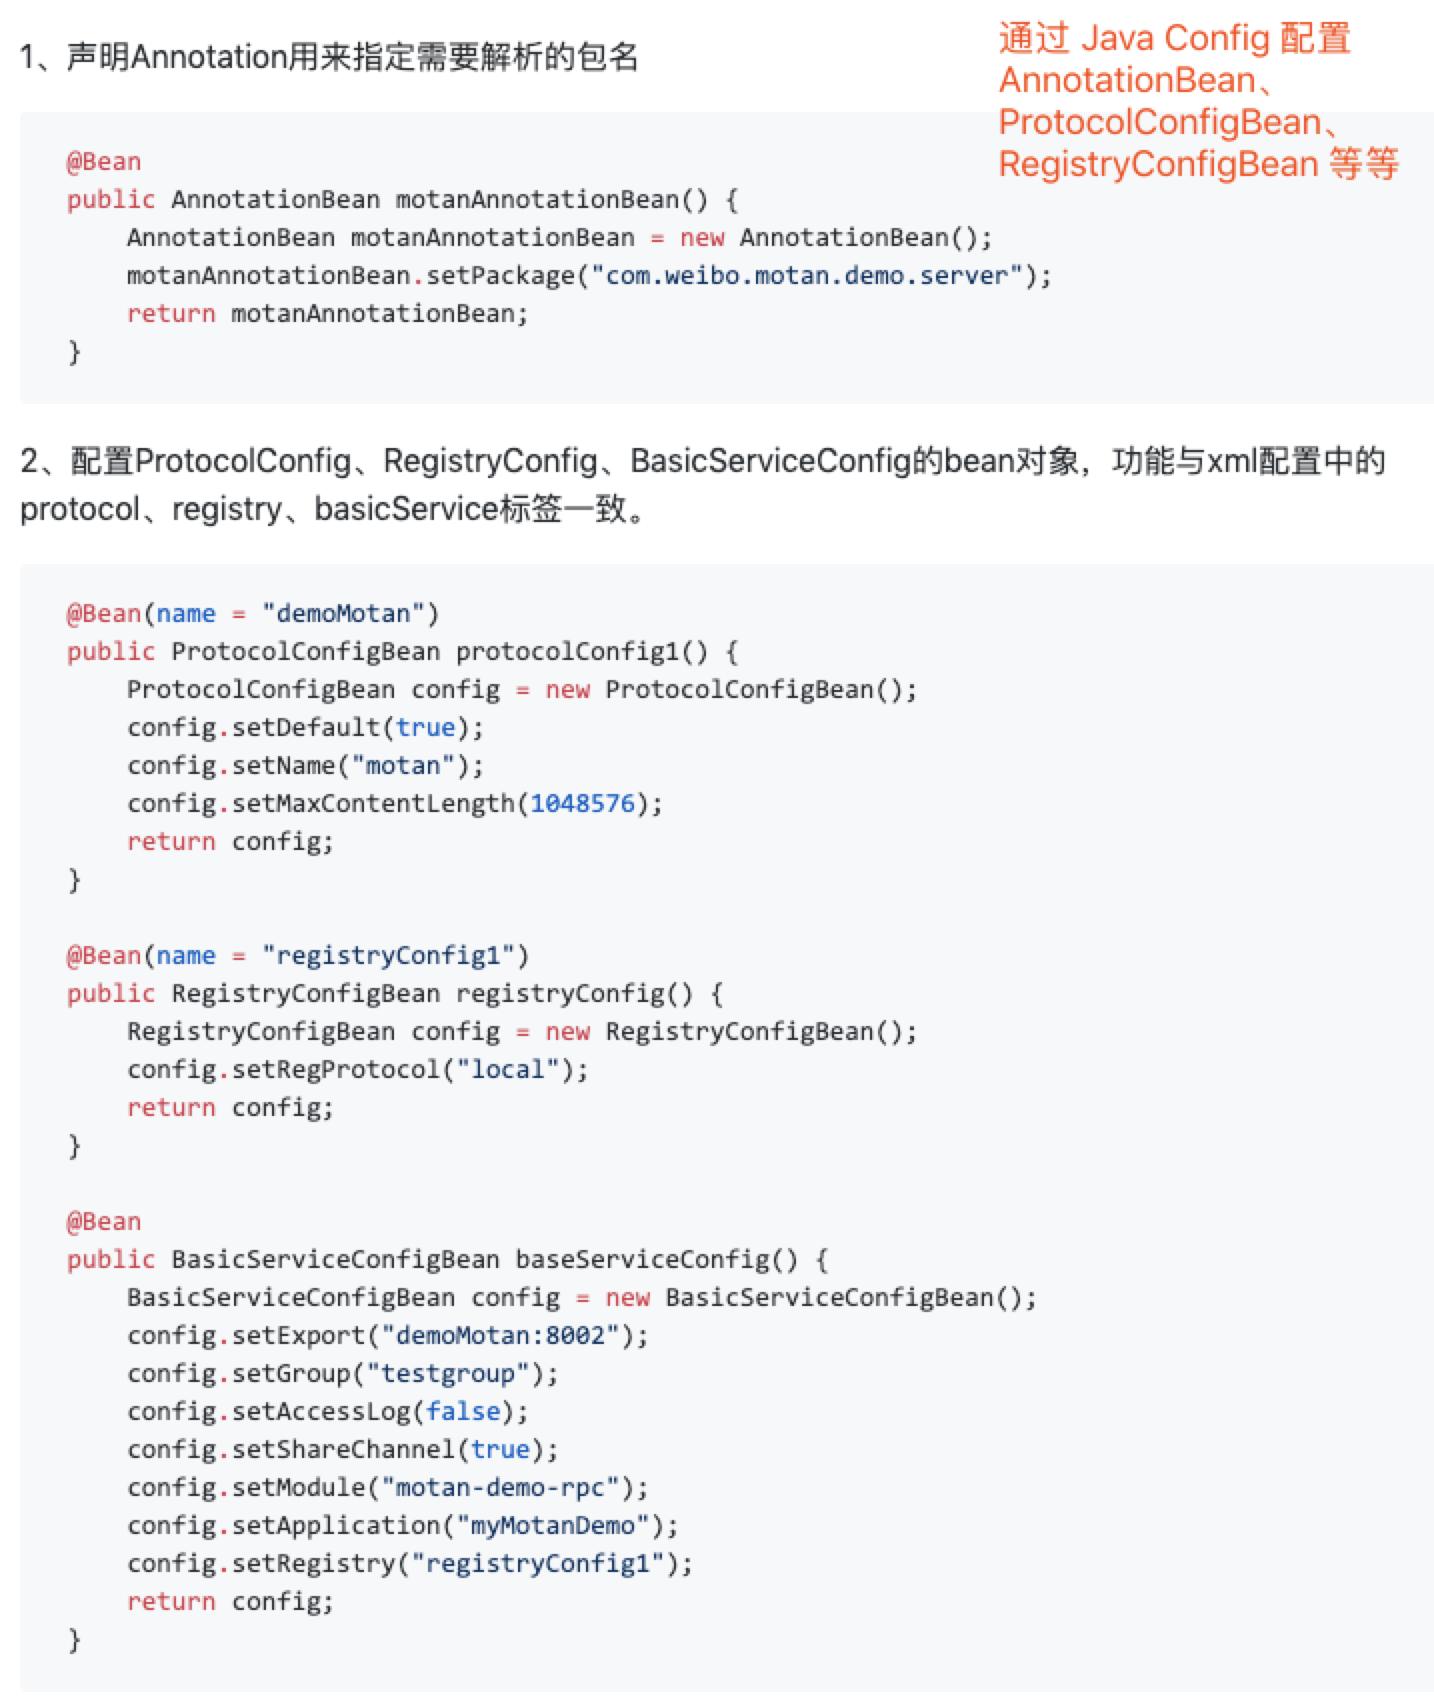 Java Config